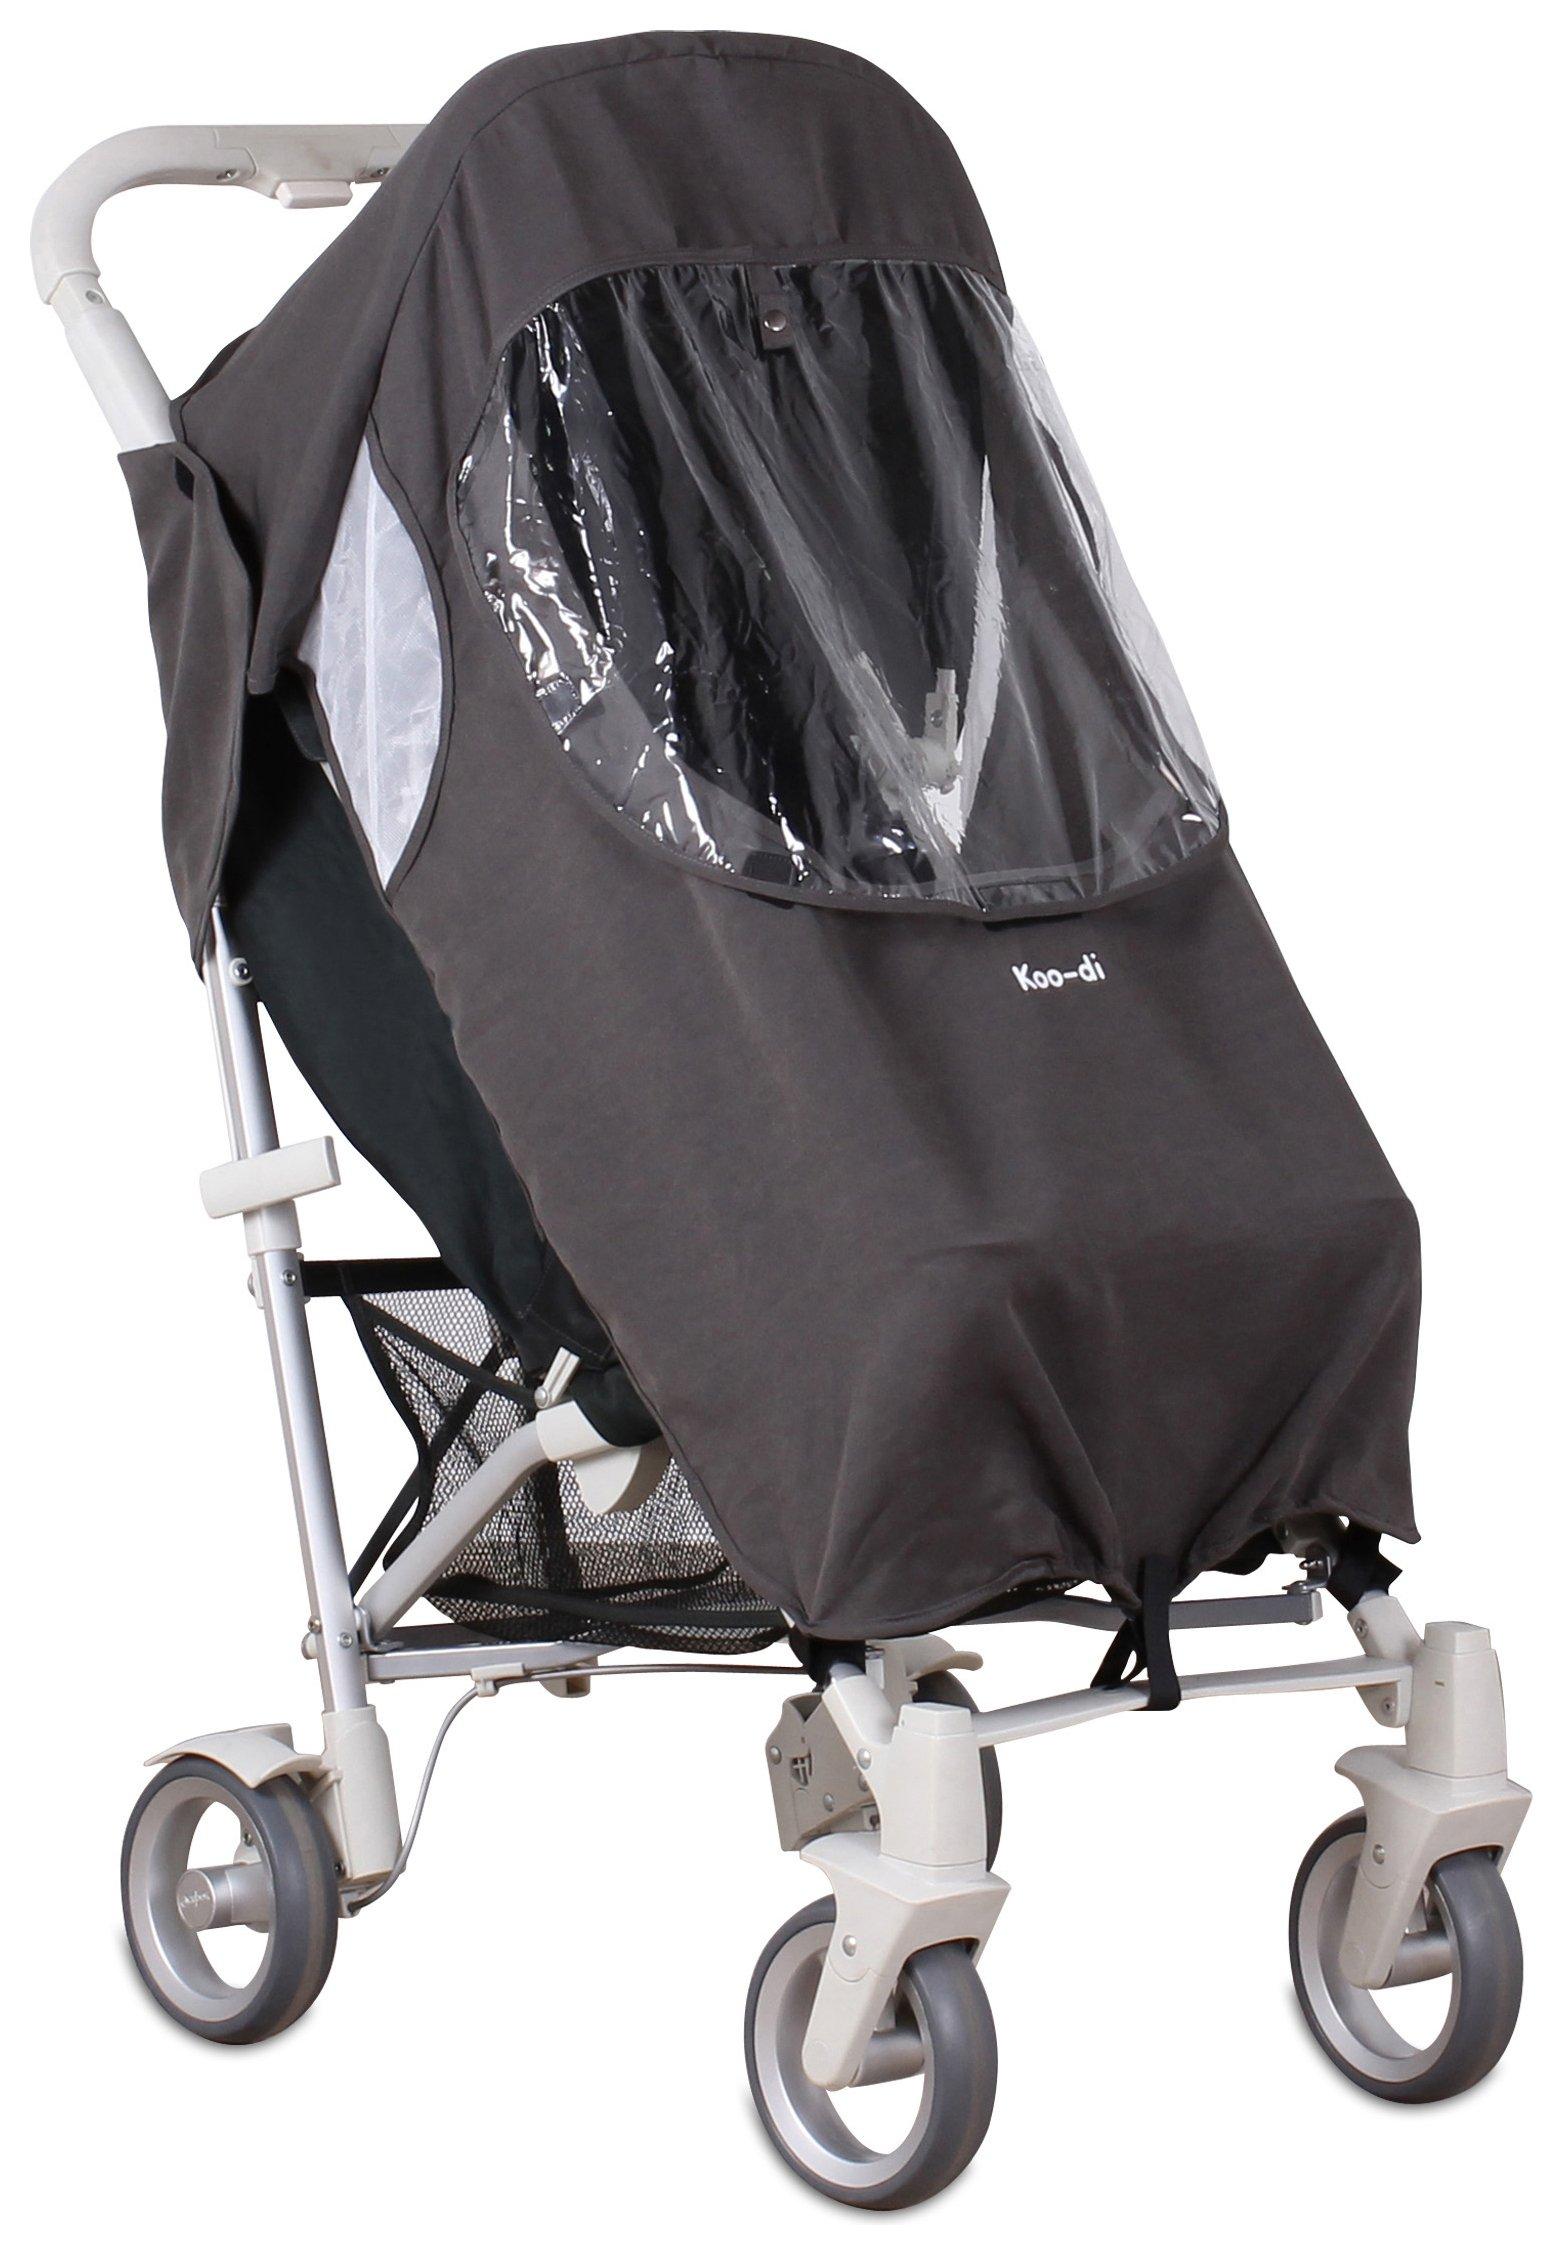 Koo-di Pack-It Universal Pushchair Raincover - Grey.